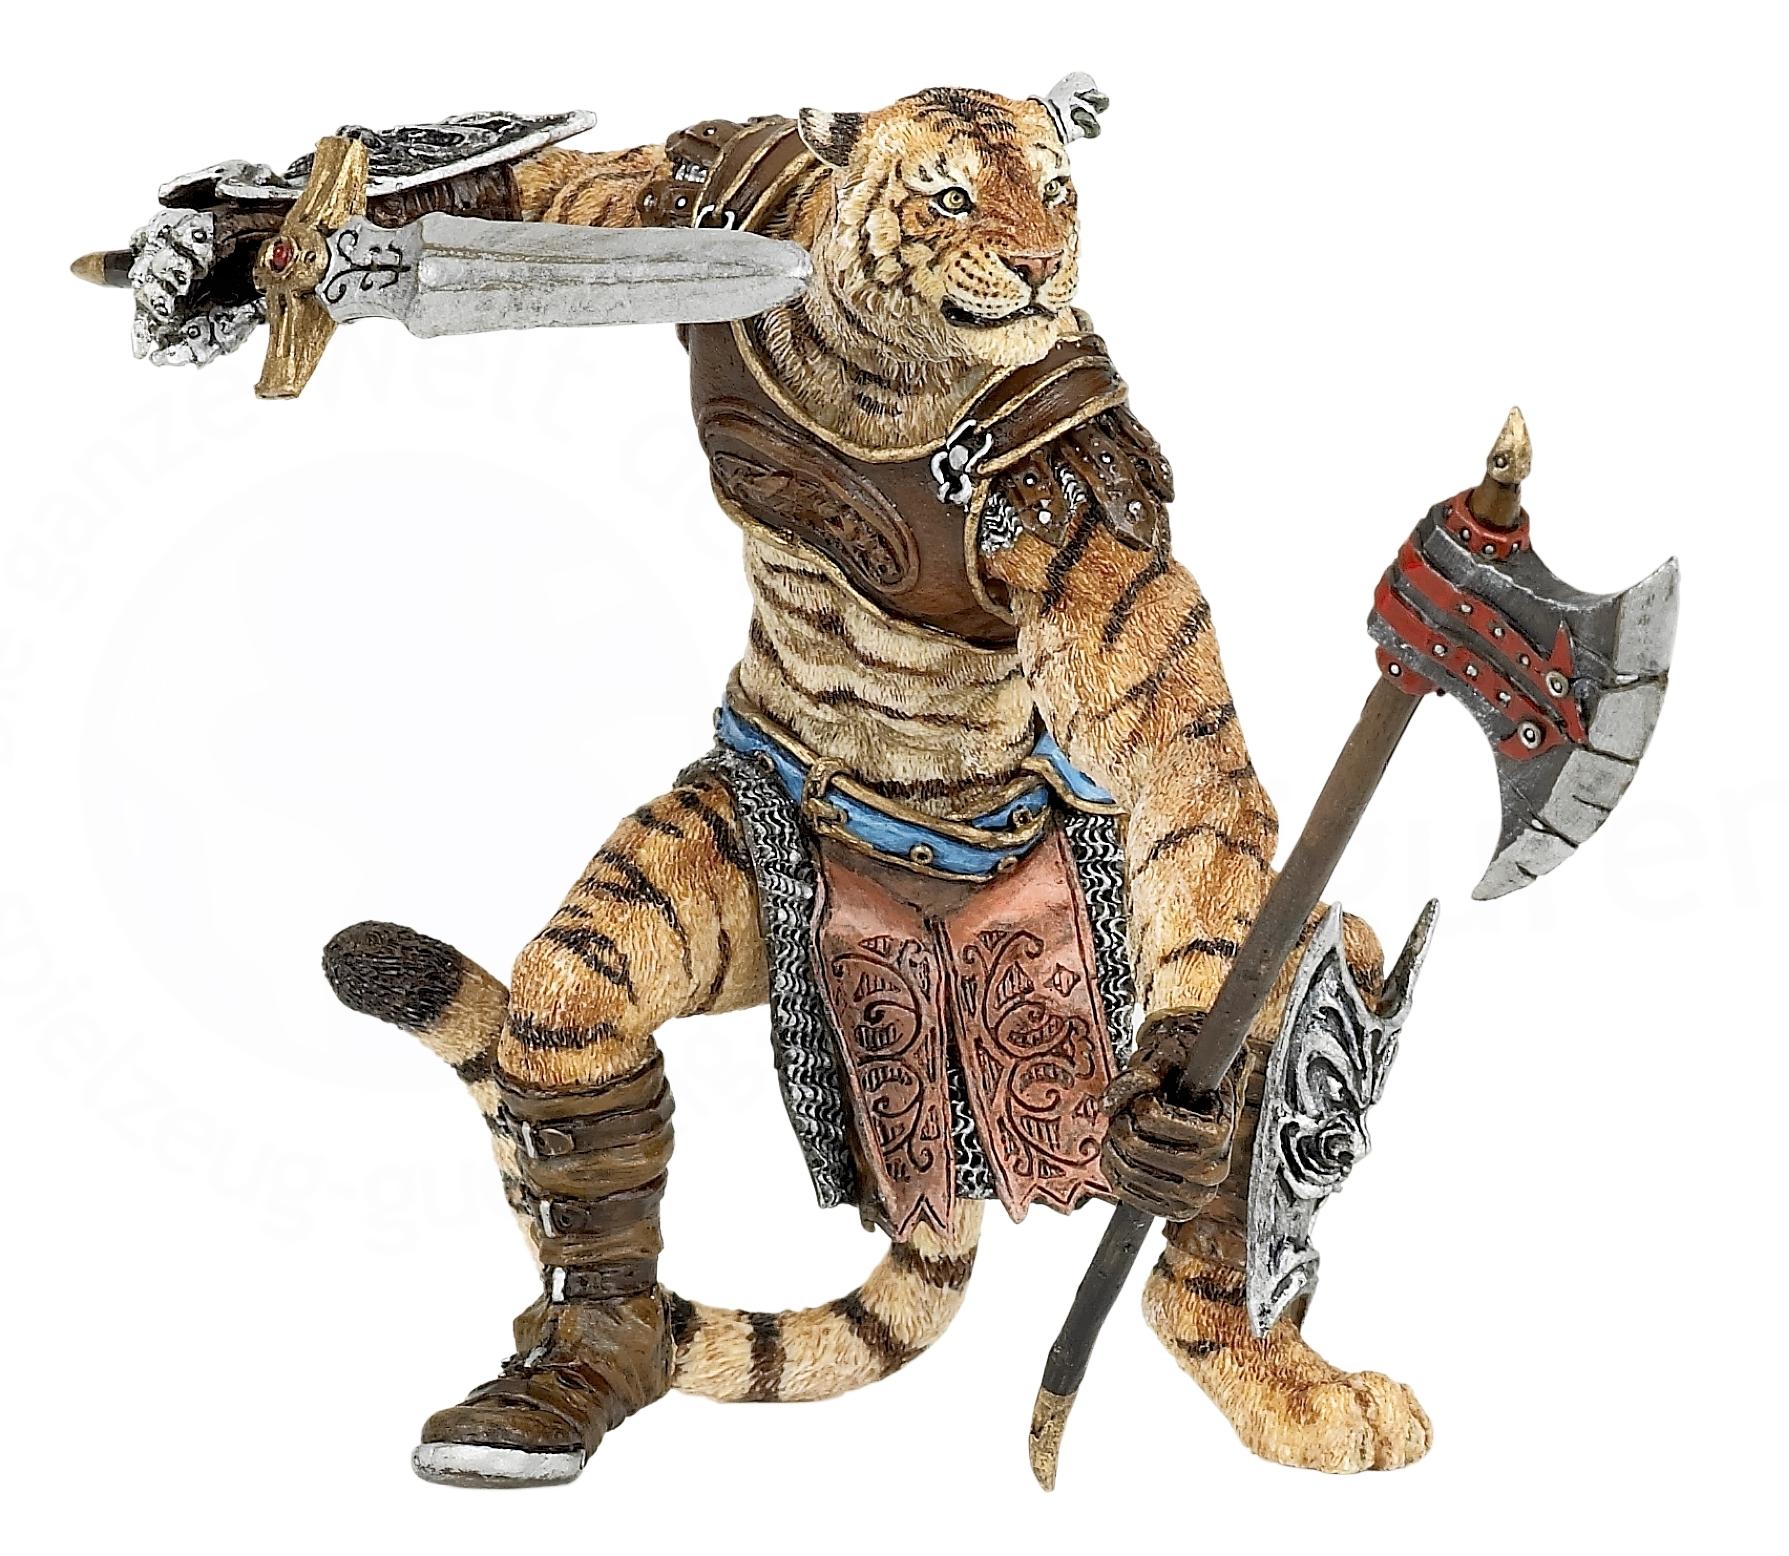 Человек-тигр - Замки, рыцари, крепости, пираты, артикул: 82544